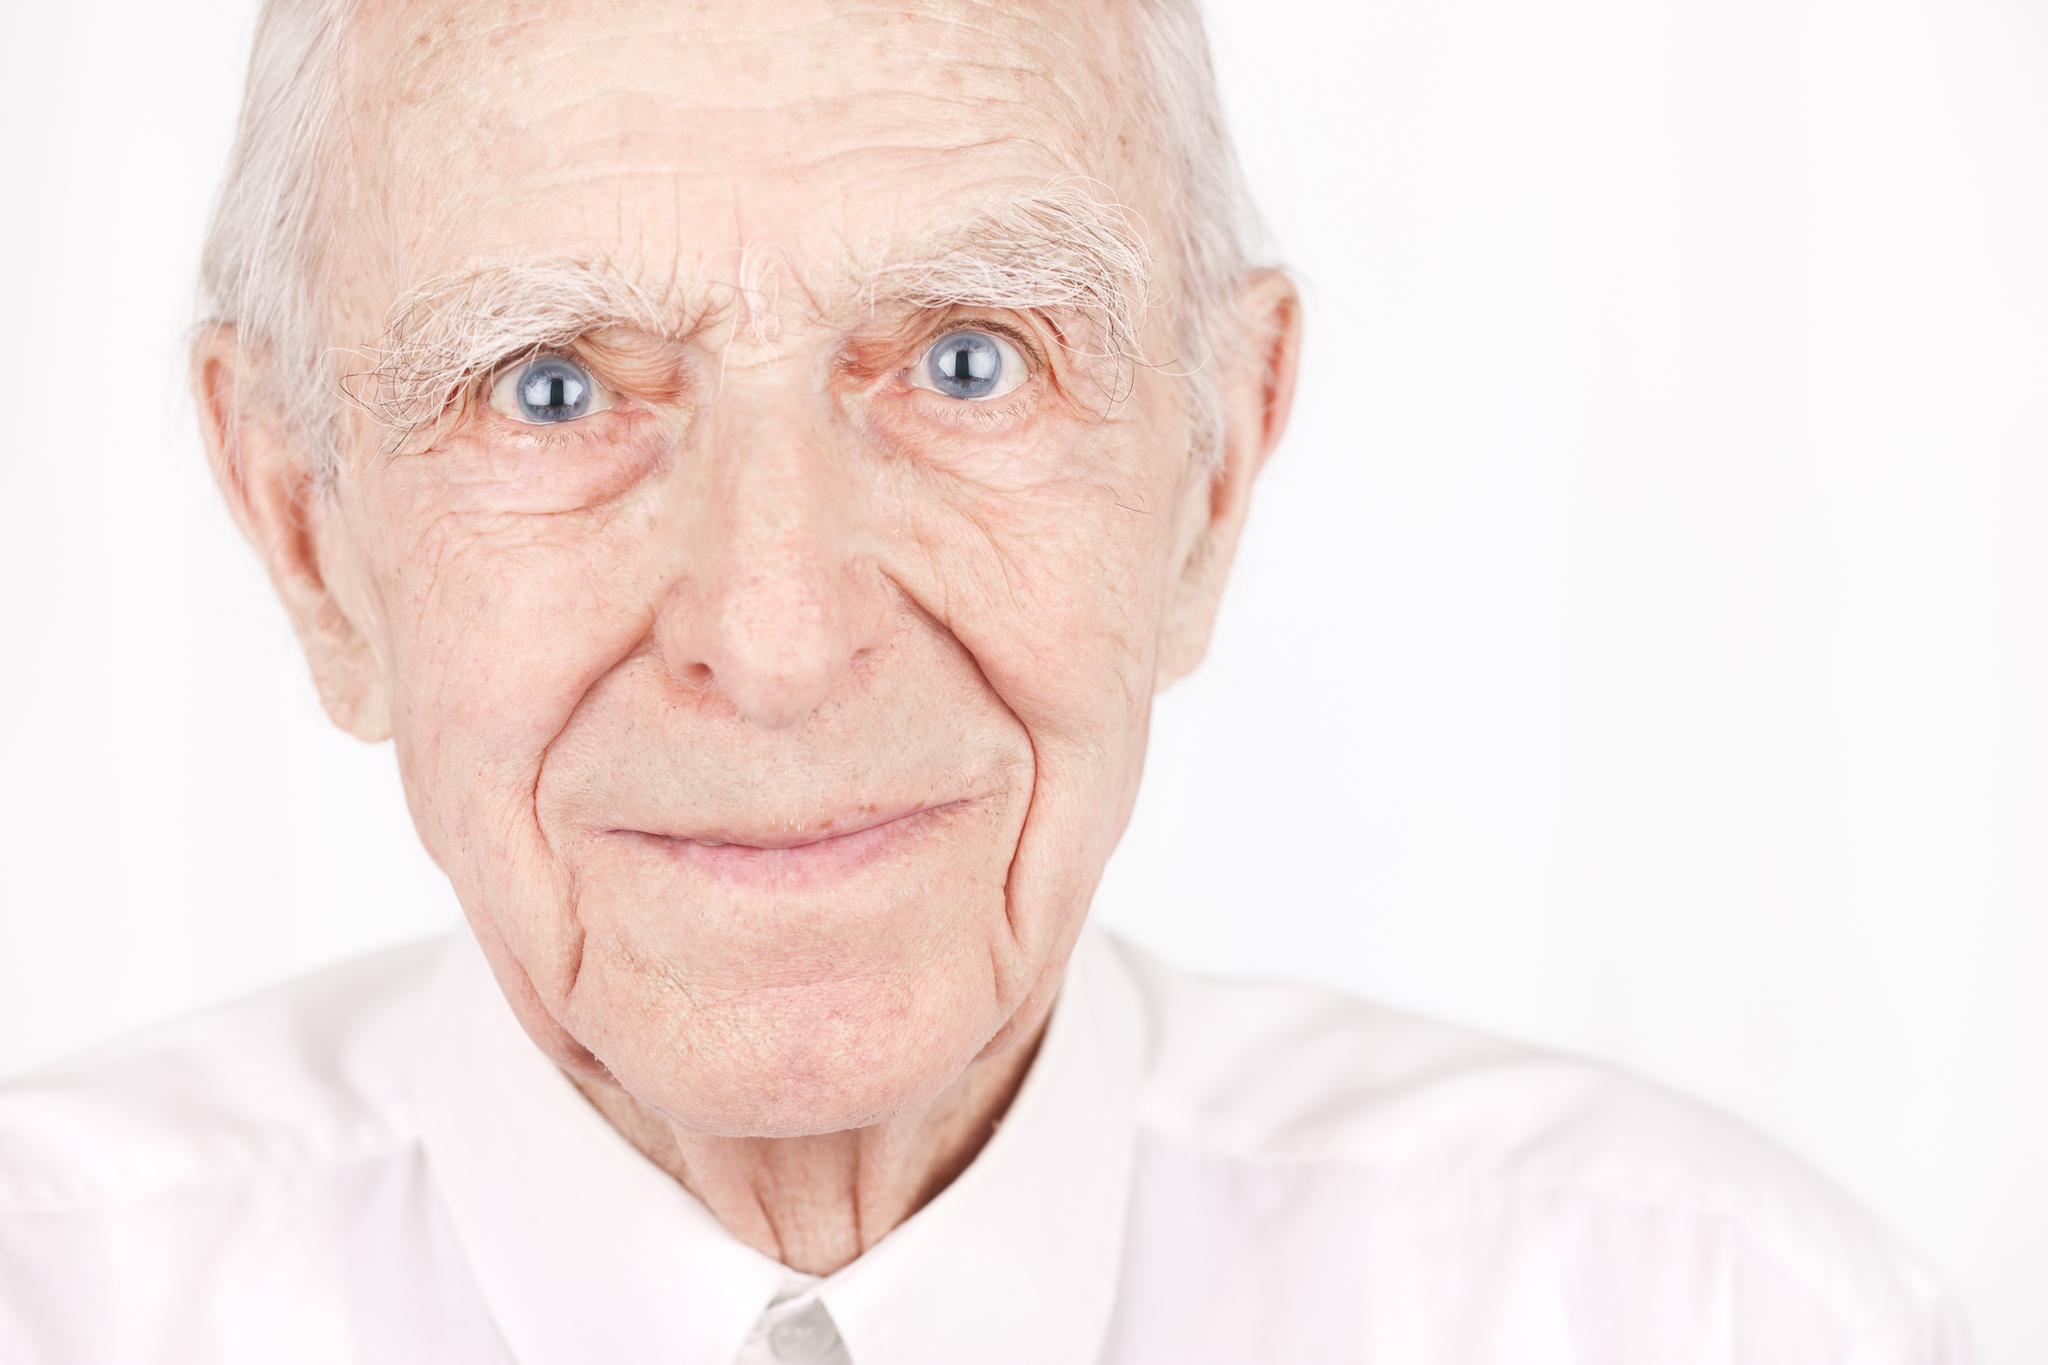 Smiling senior man portrait on white. Canon 1Ds Mark III